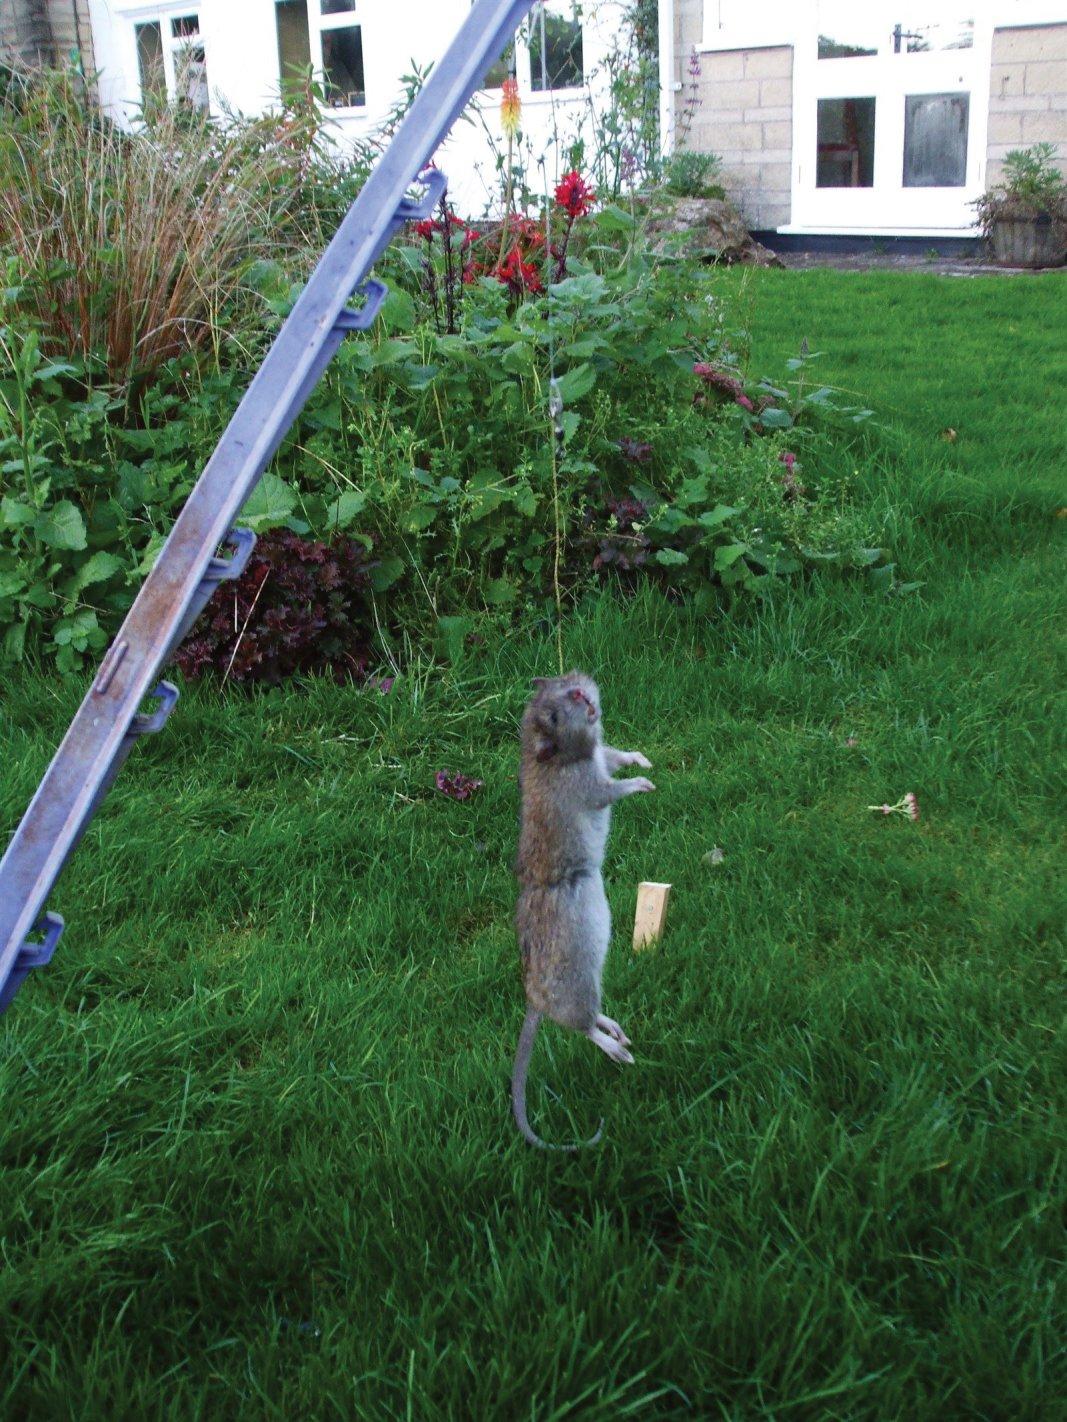 Snared rat